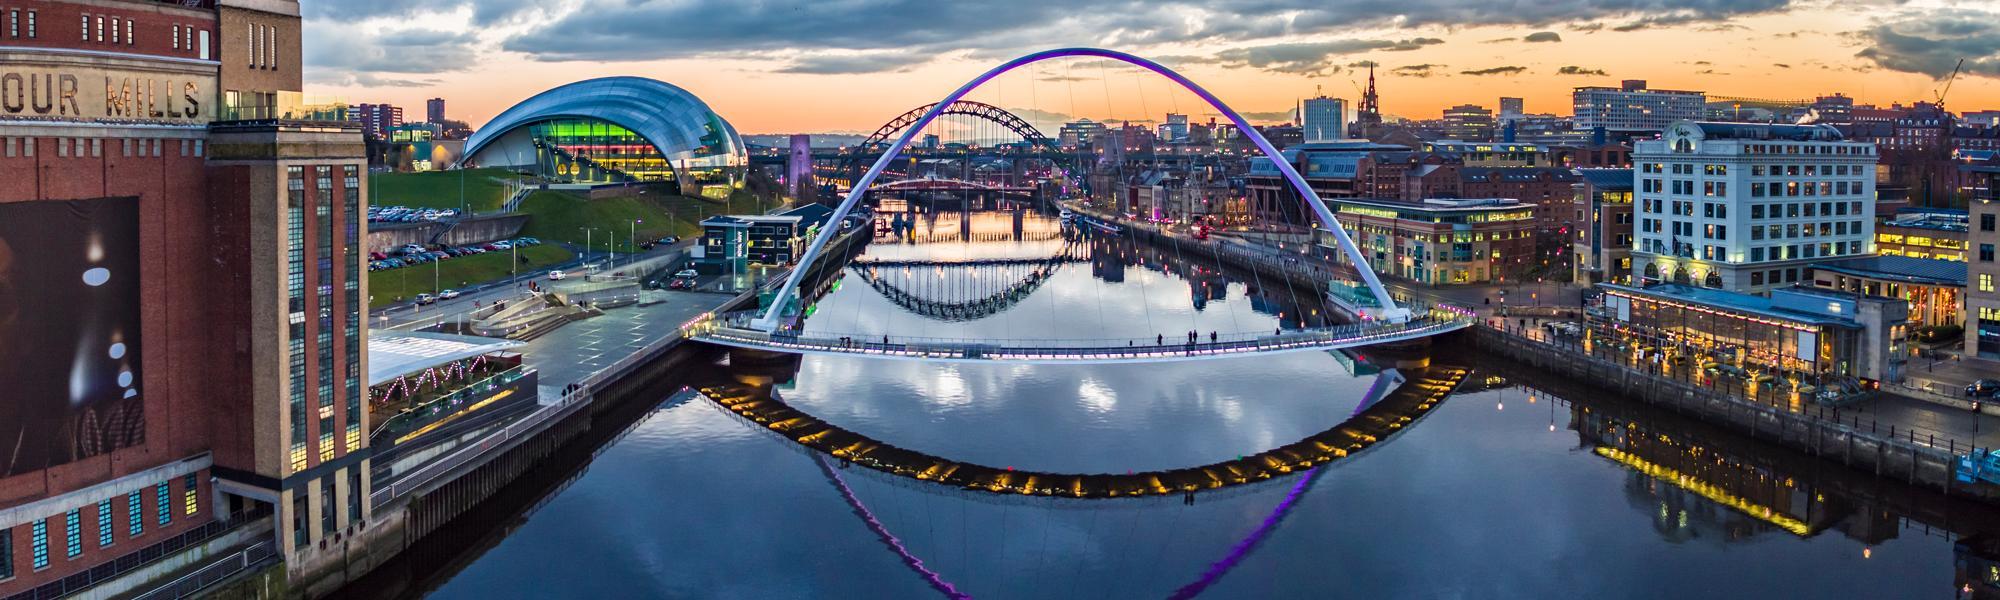 Gateshead Newcastle Quayside venue hire